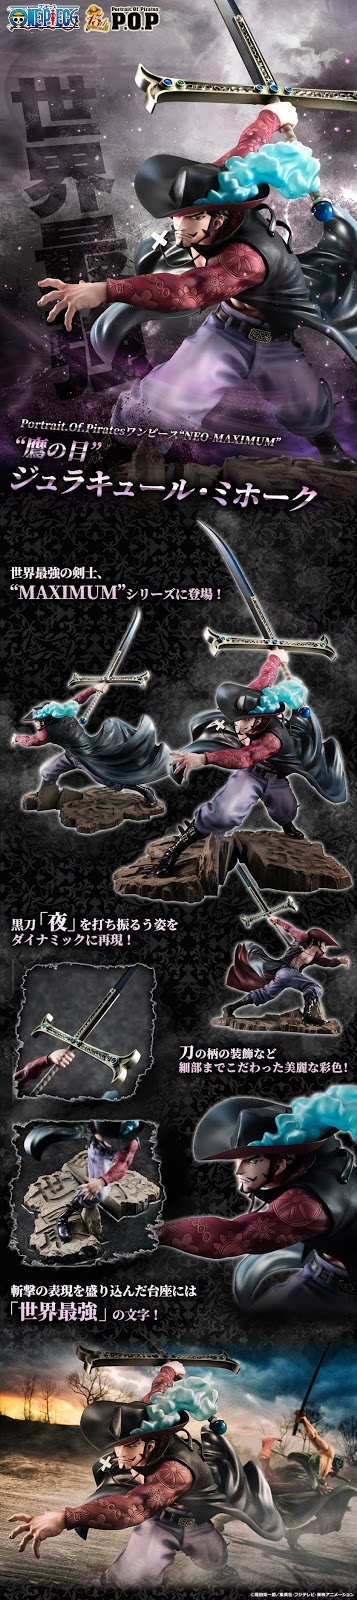 https://www.biginjap.com/en/pvc-figures/23641-one-piece-portrait-of-pirates-neo-maximum-dracule-mihawk.html